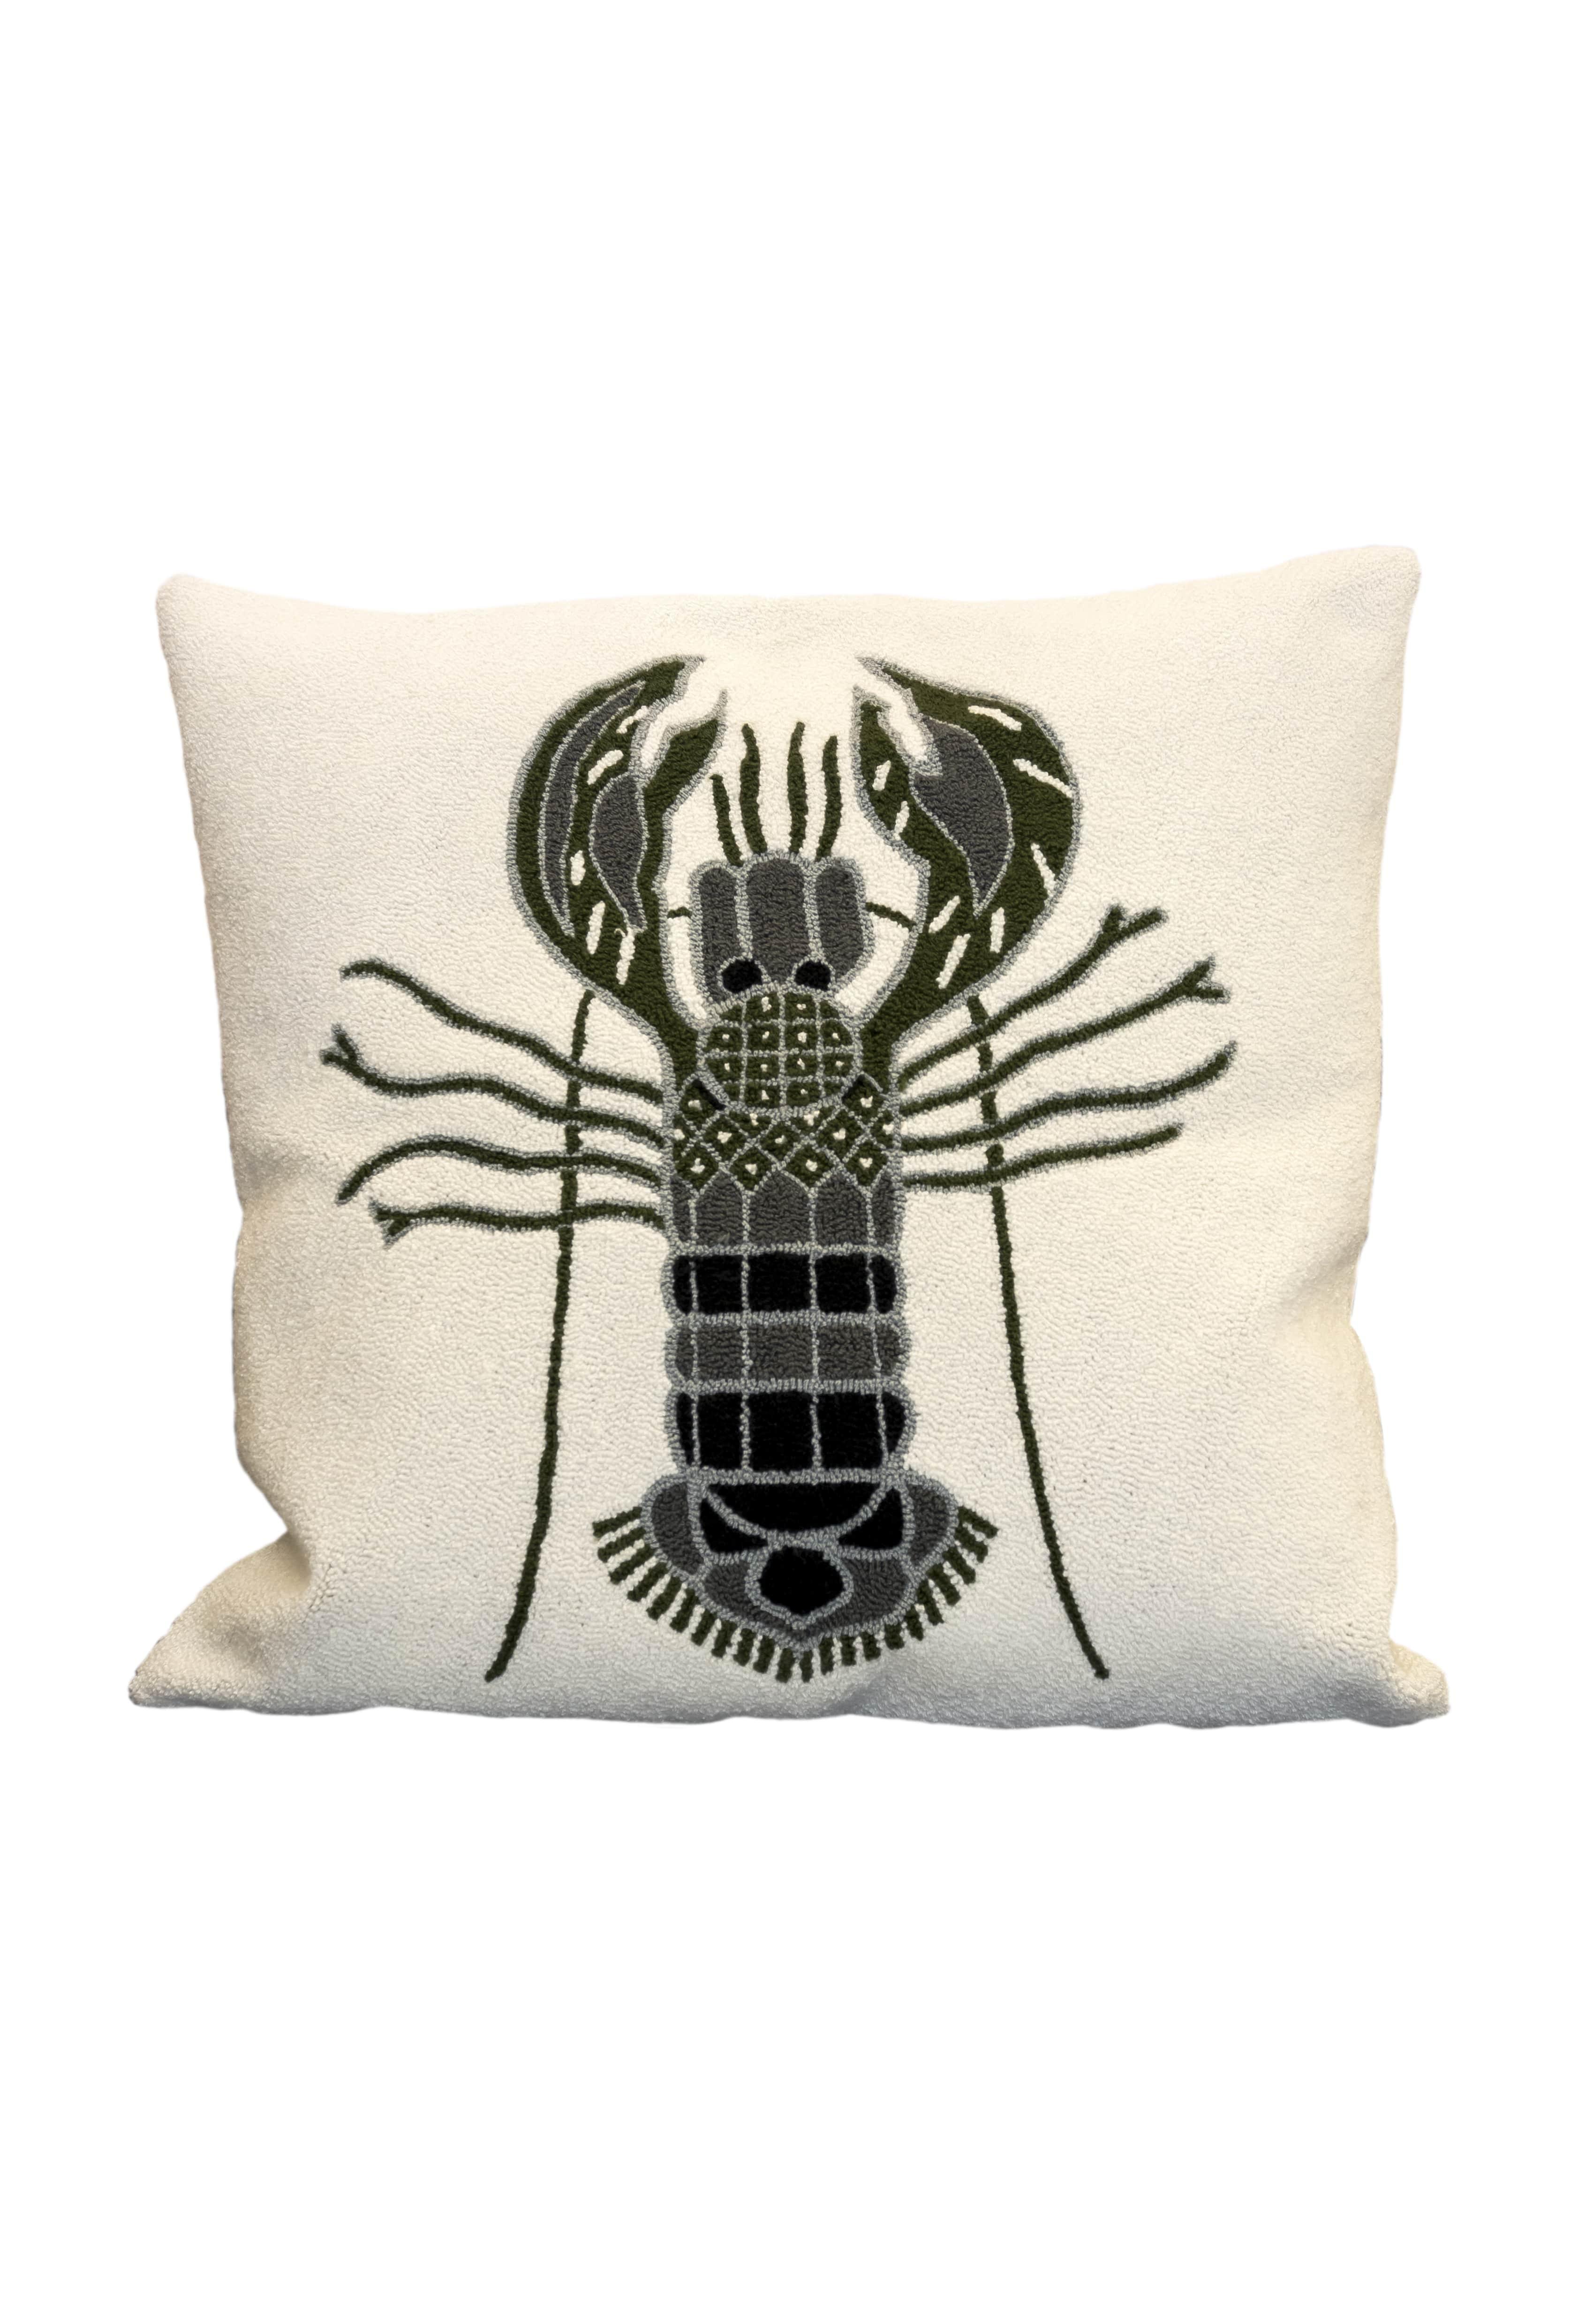 Puyao Lobster grey cushion